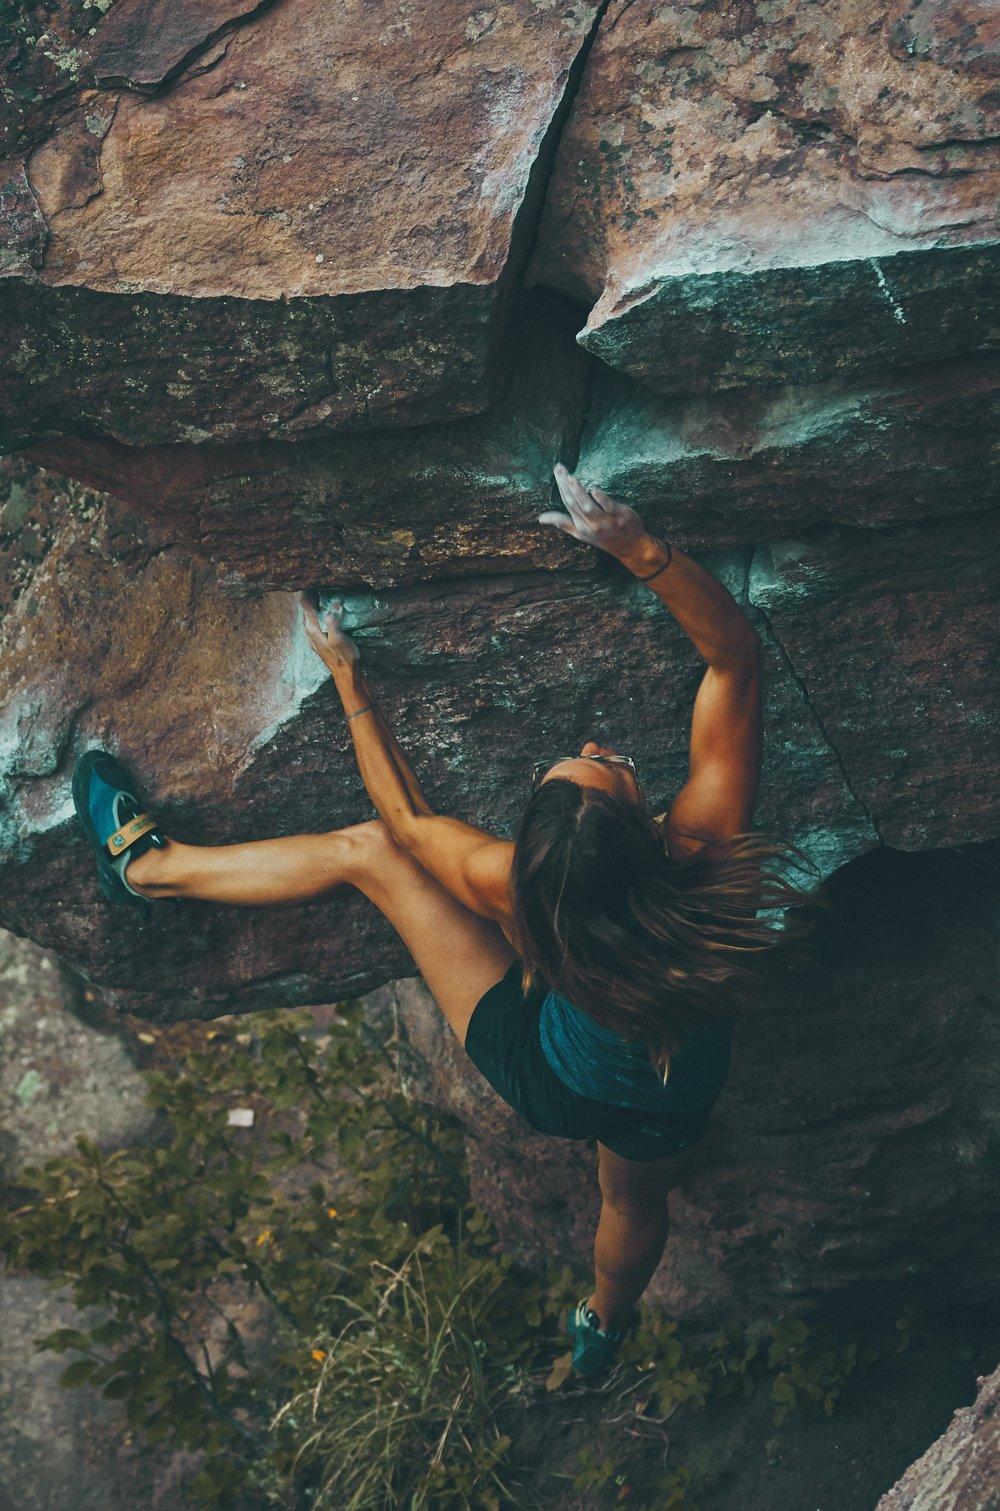 rockclimbing woman.jpg